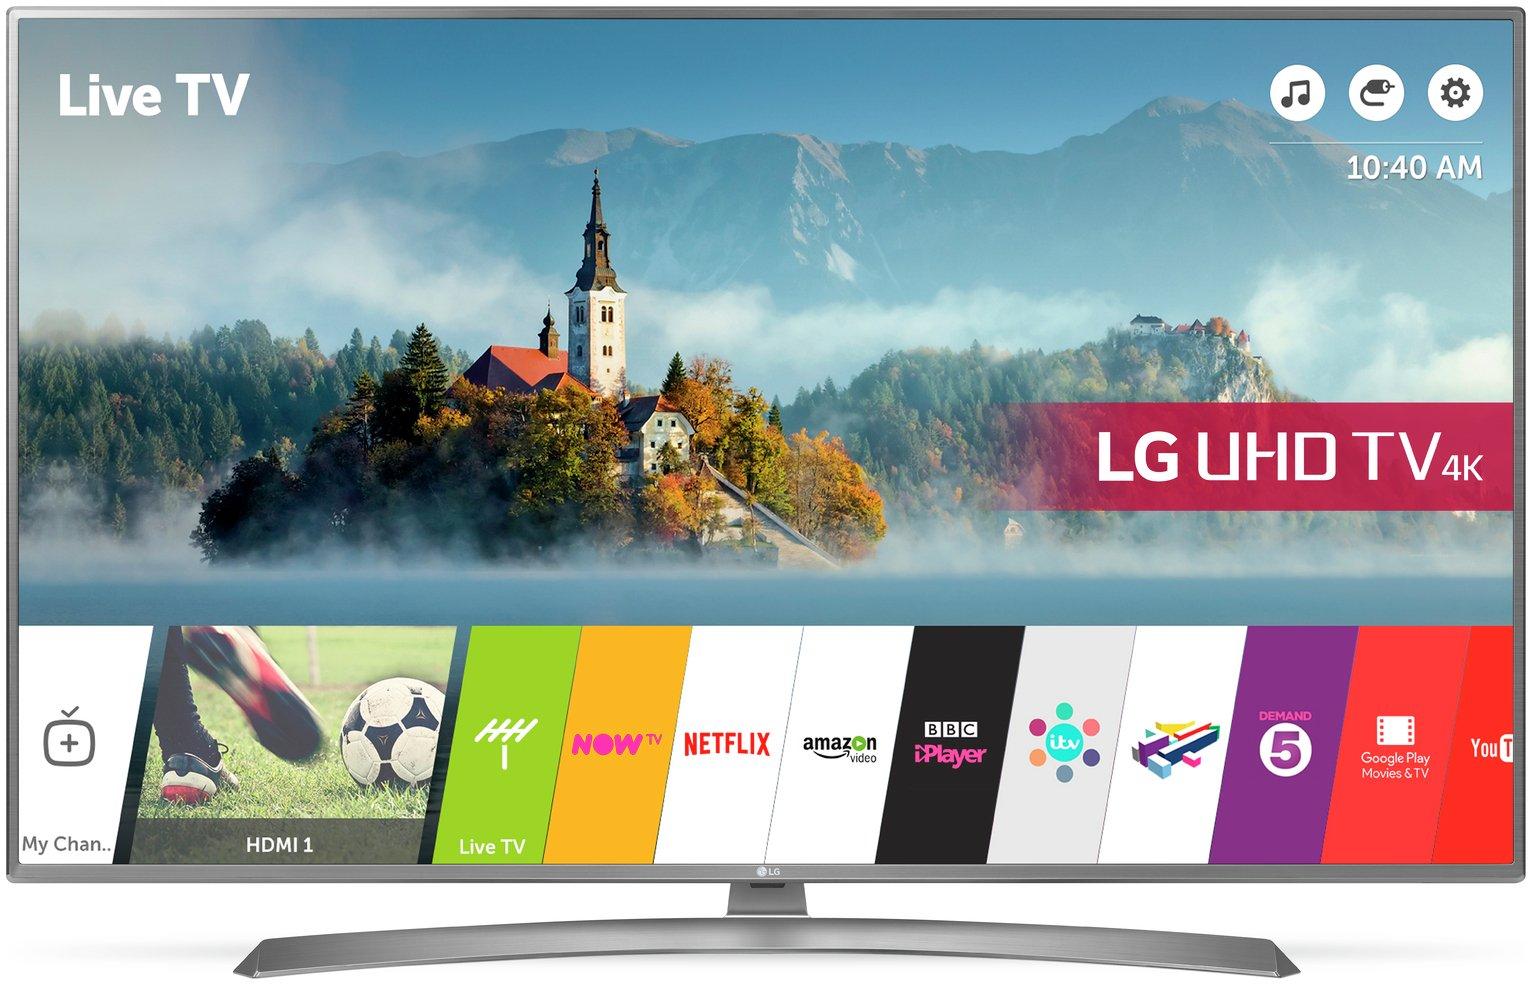 LG 49 Inch 49UJ670V Smart 4K UHD TV with HDR